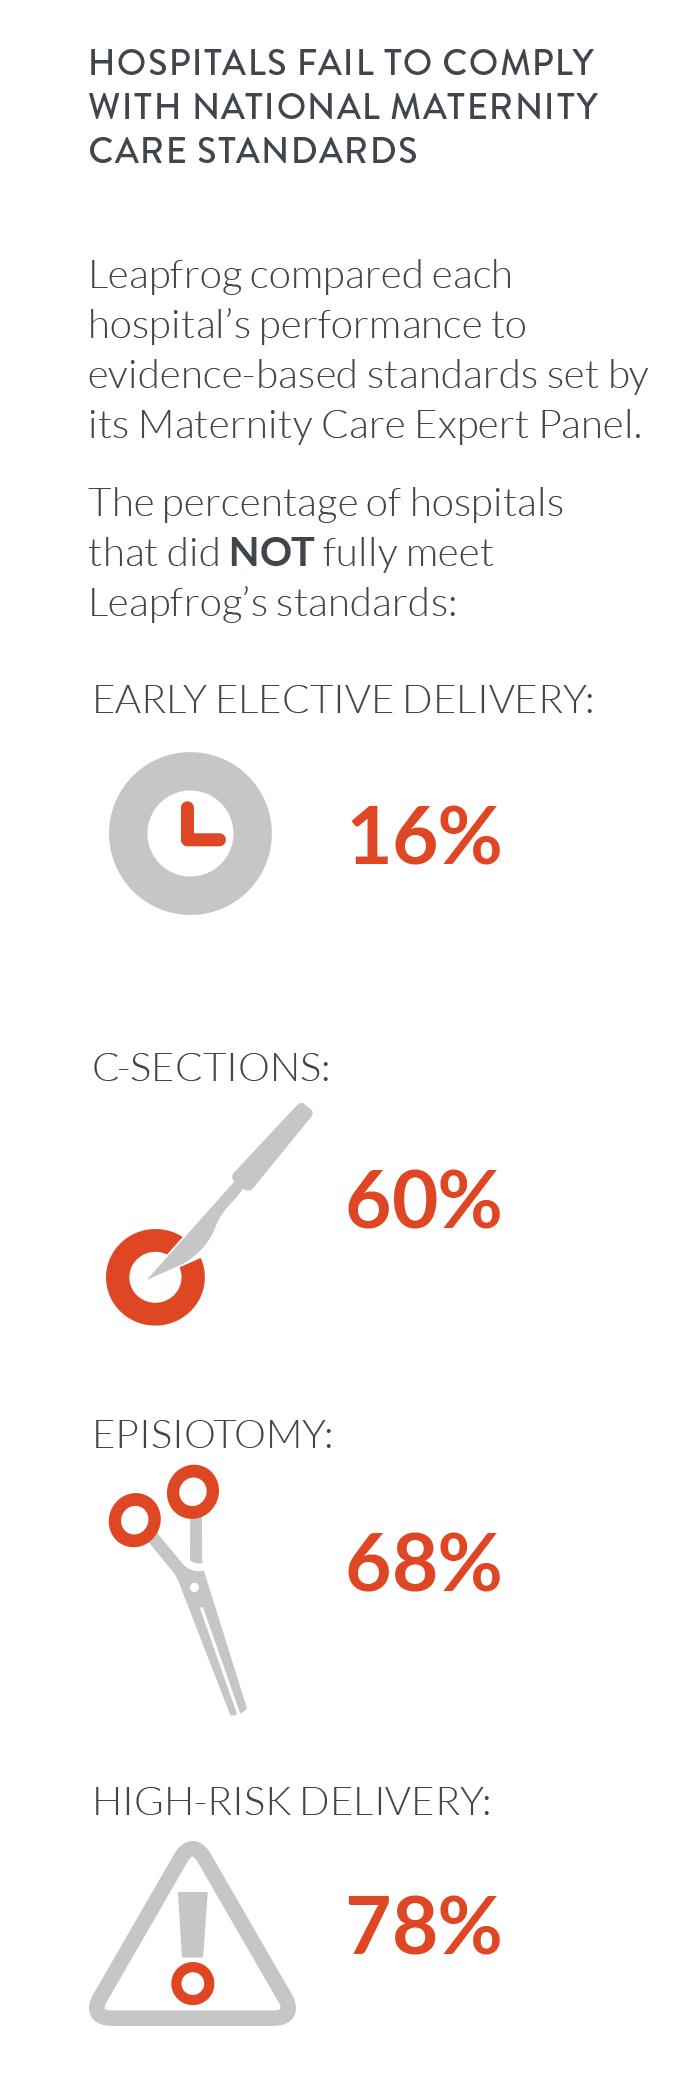 Leapfrog Maternity Care Report Figure 1